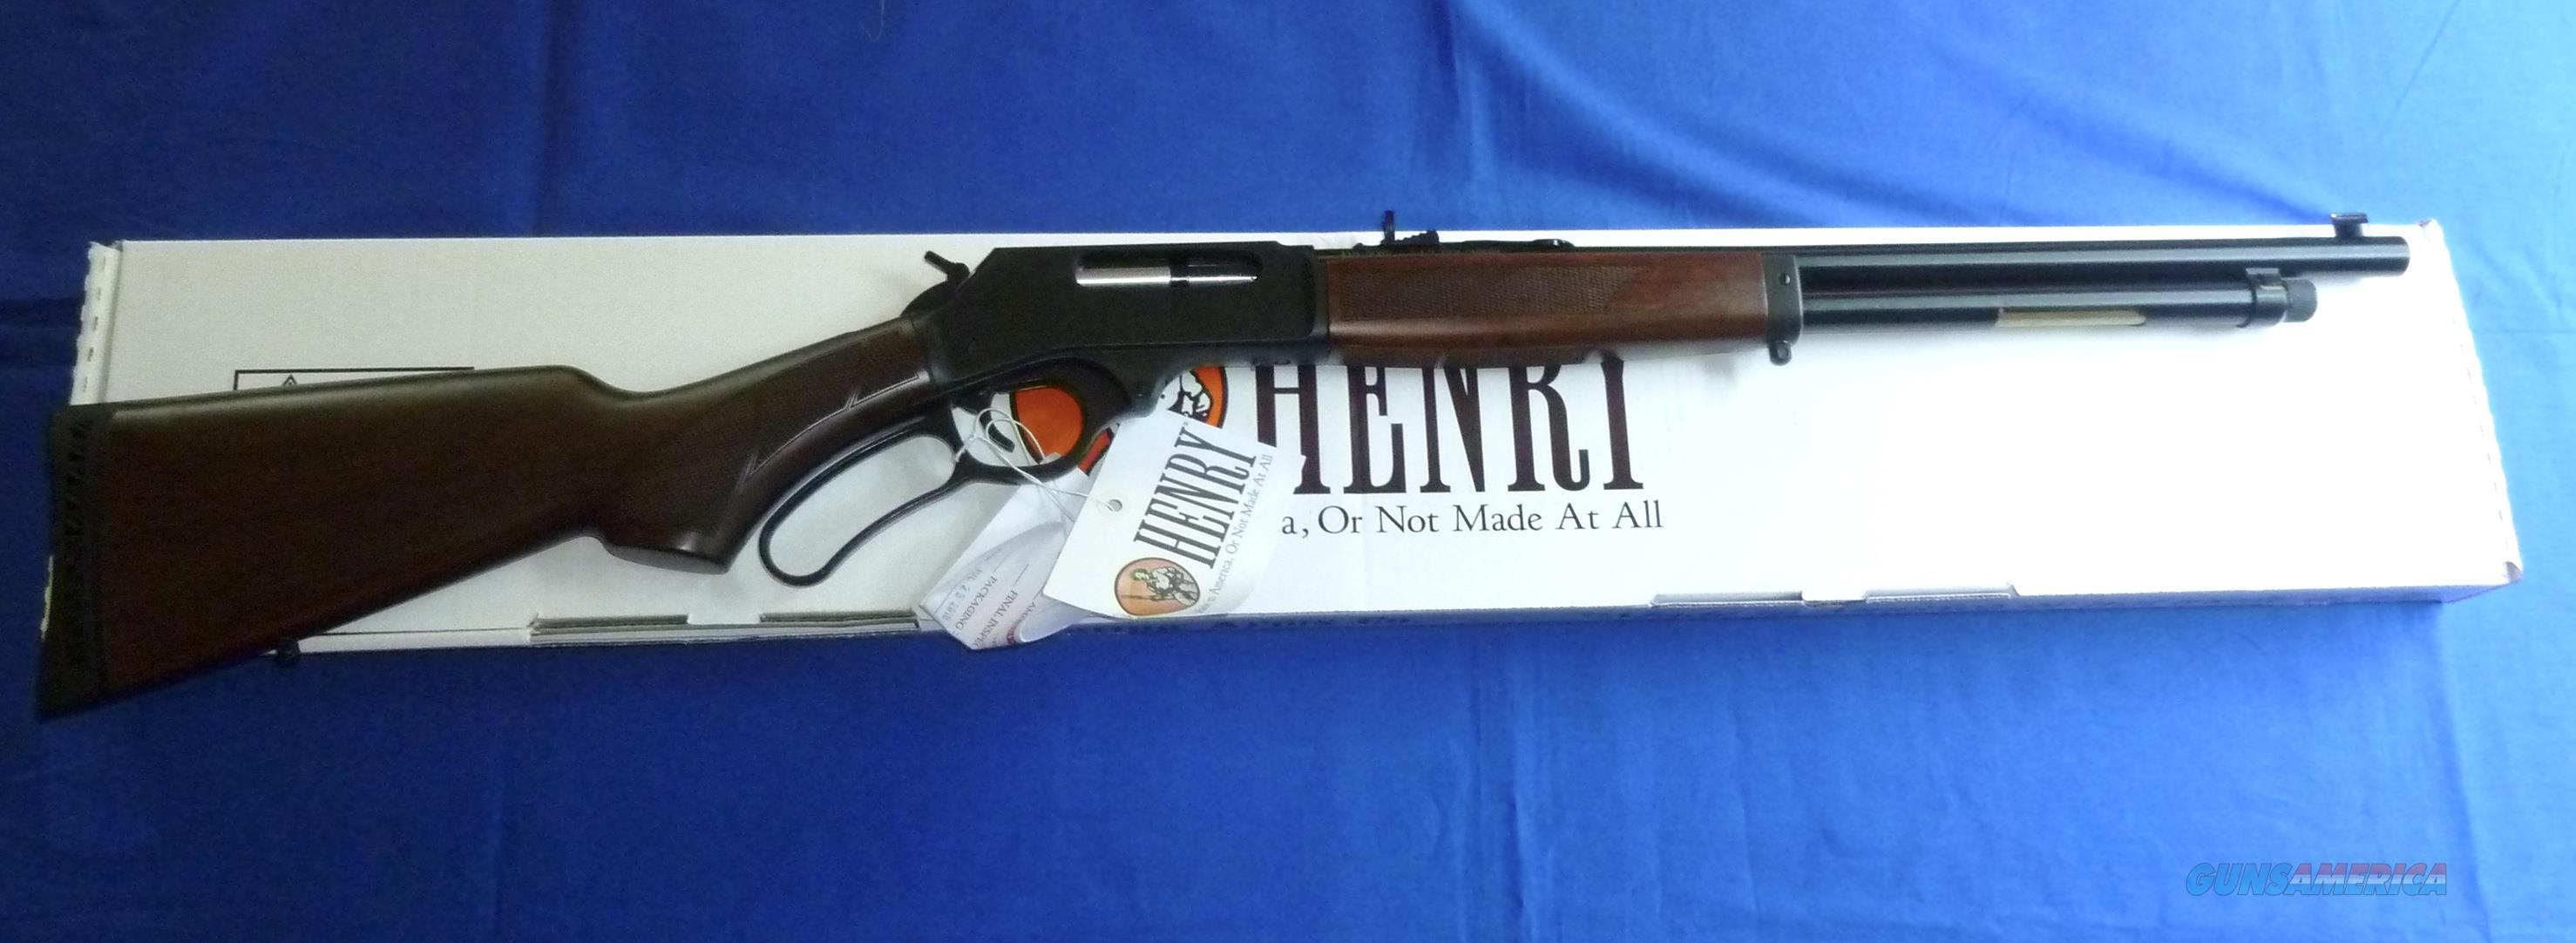 HENRY 410 GAUGE LEVER ACTION SHOTUN  Guns > Shotguns > Henry Shotguns